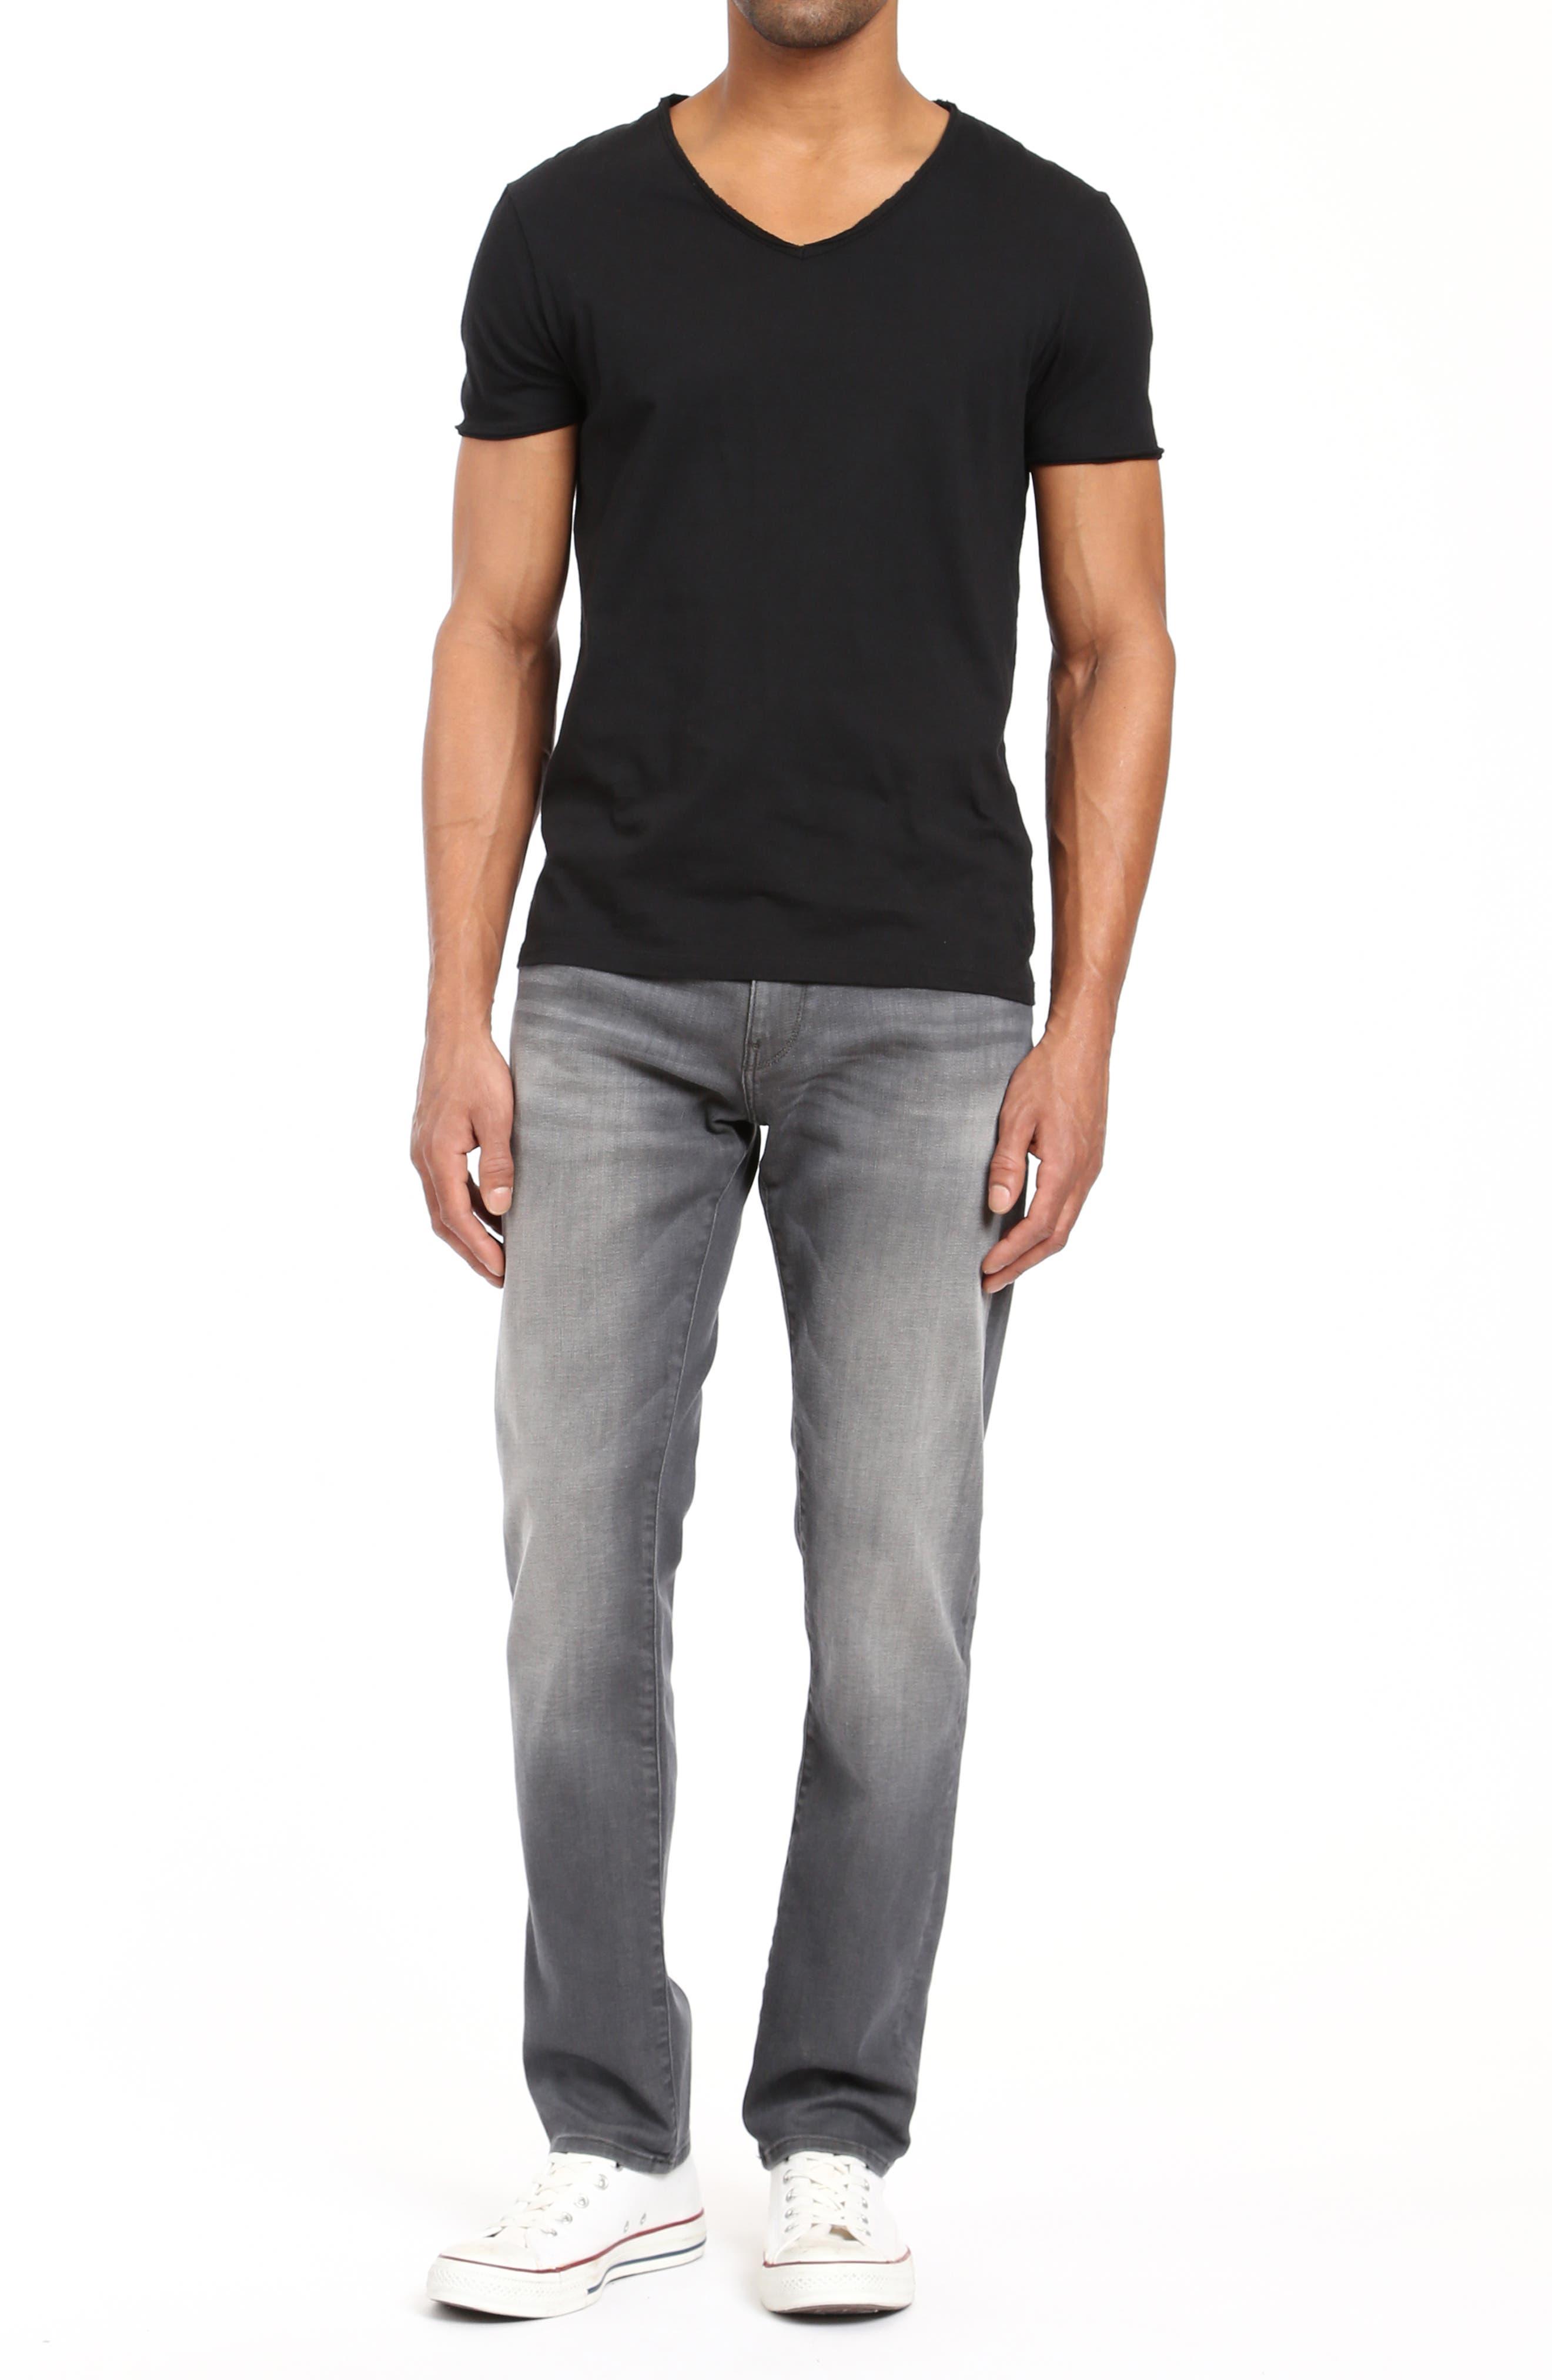 Zach Straight Leg Jeans,                             Alternate thumbnail 4, color,                             LIGHT GREY BROOKLYN